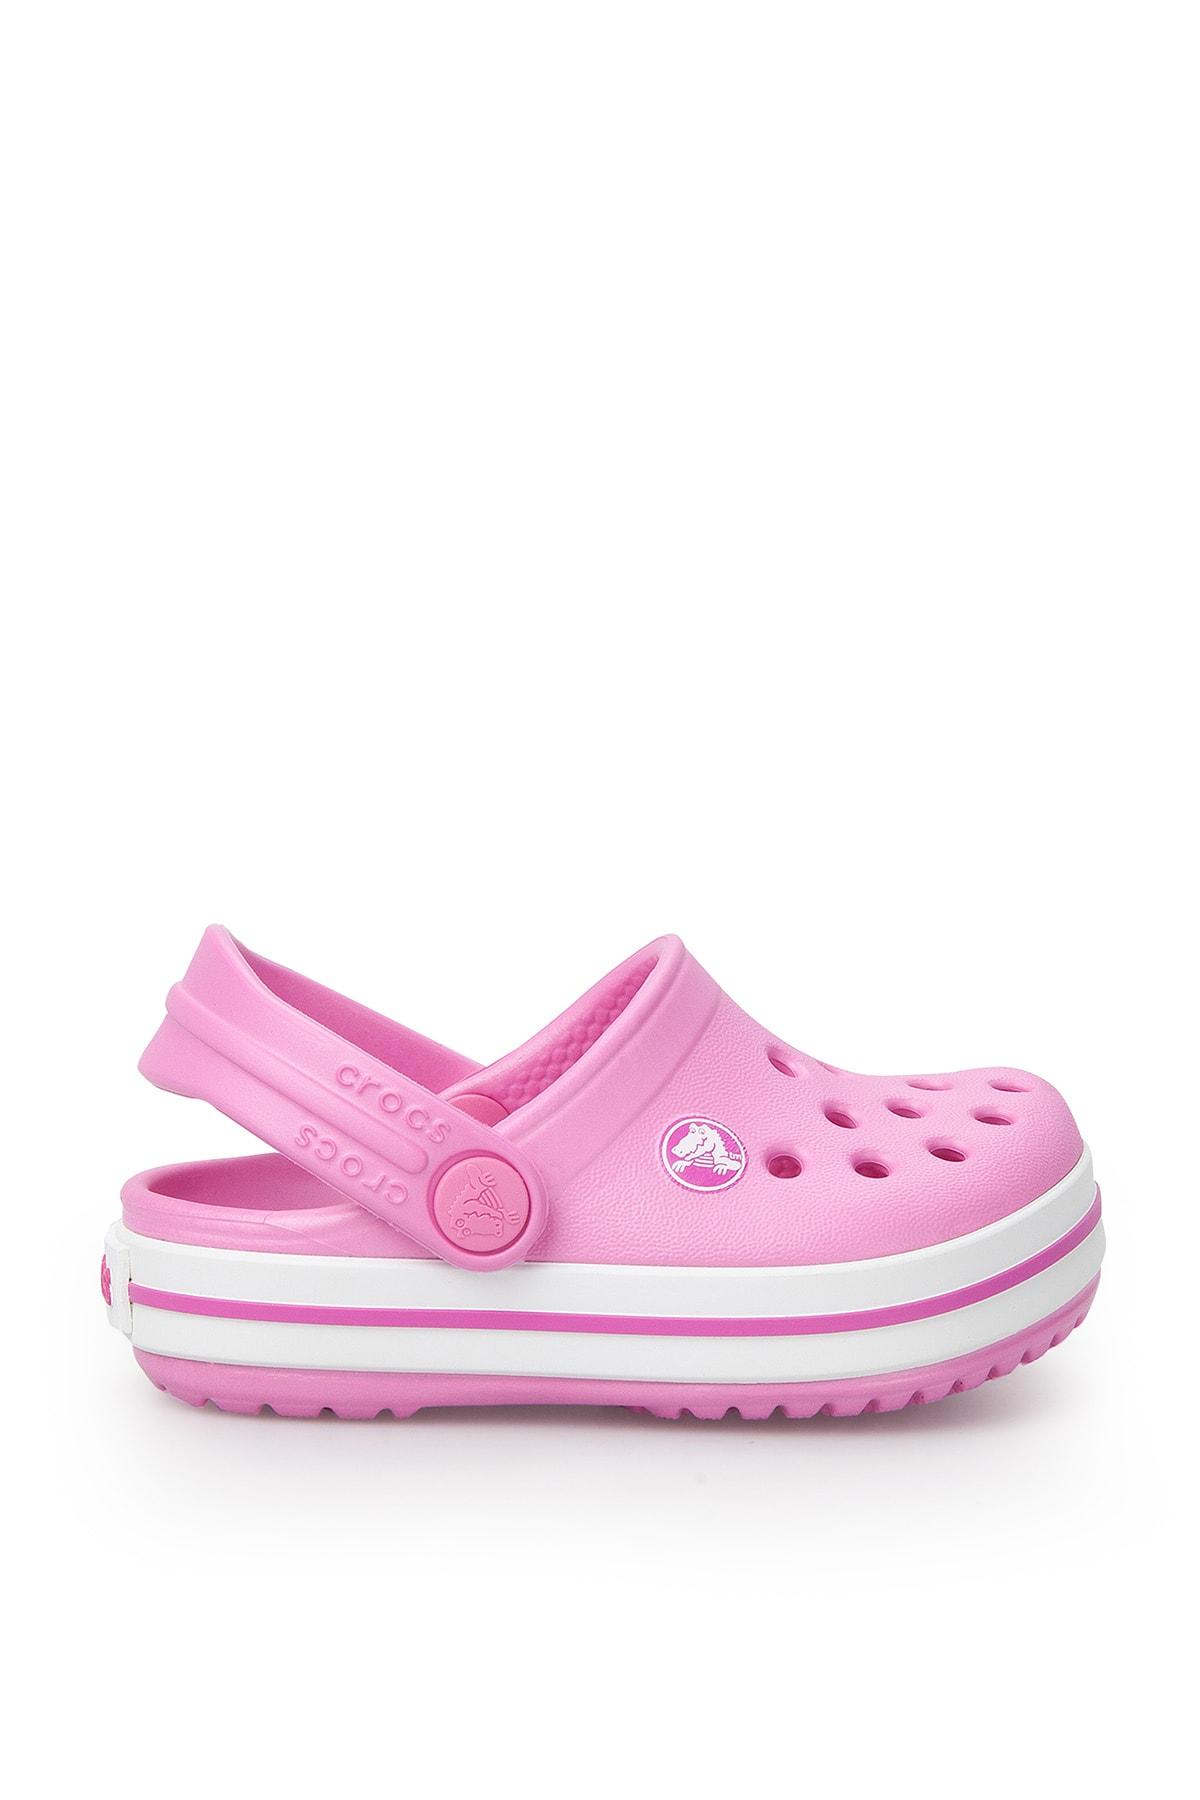 Crocs Kids Pembe Çocuk 204537 Crocband Clog K Terlik